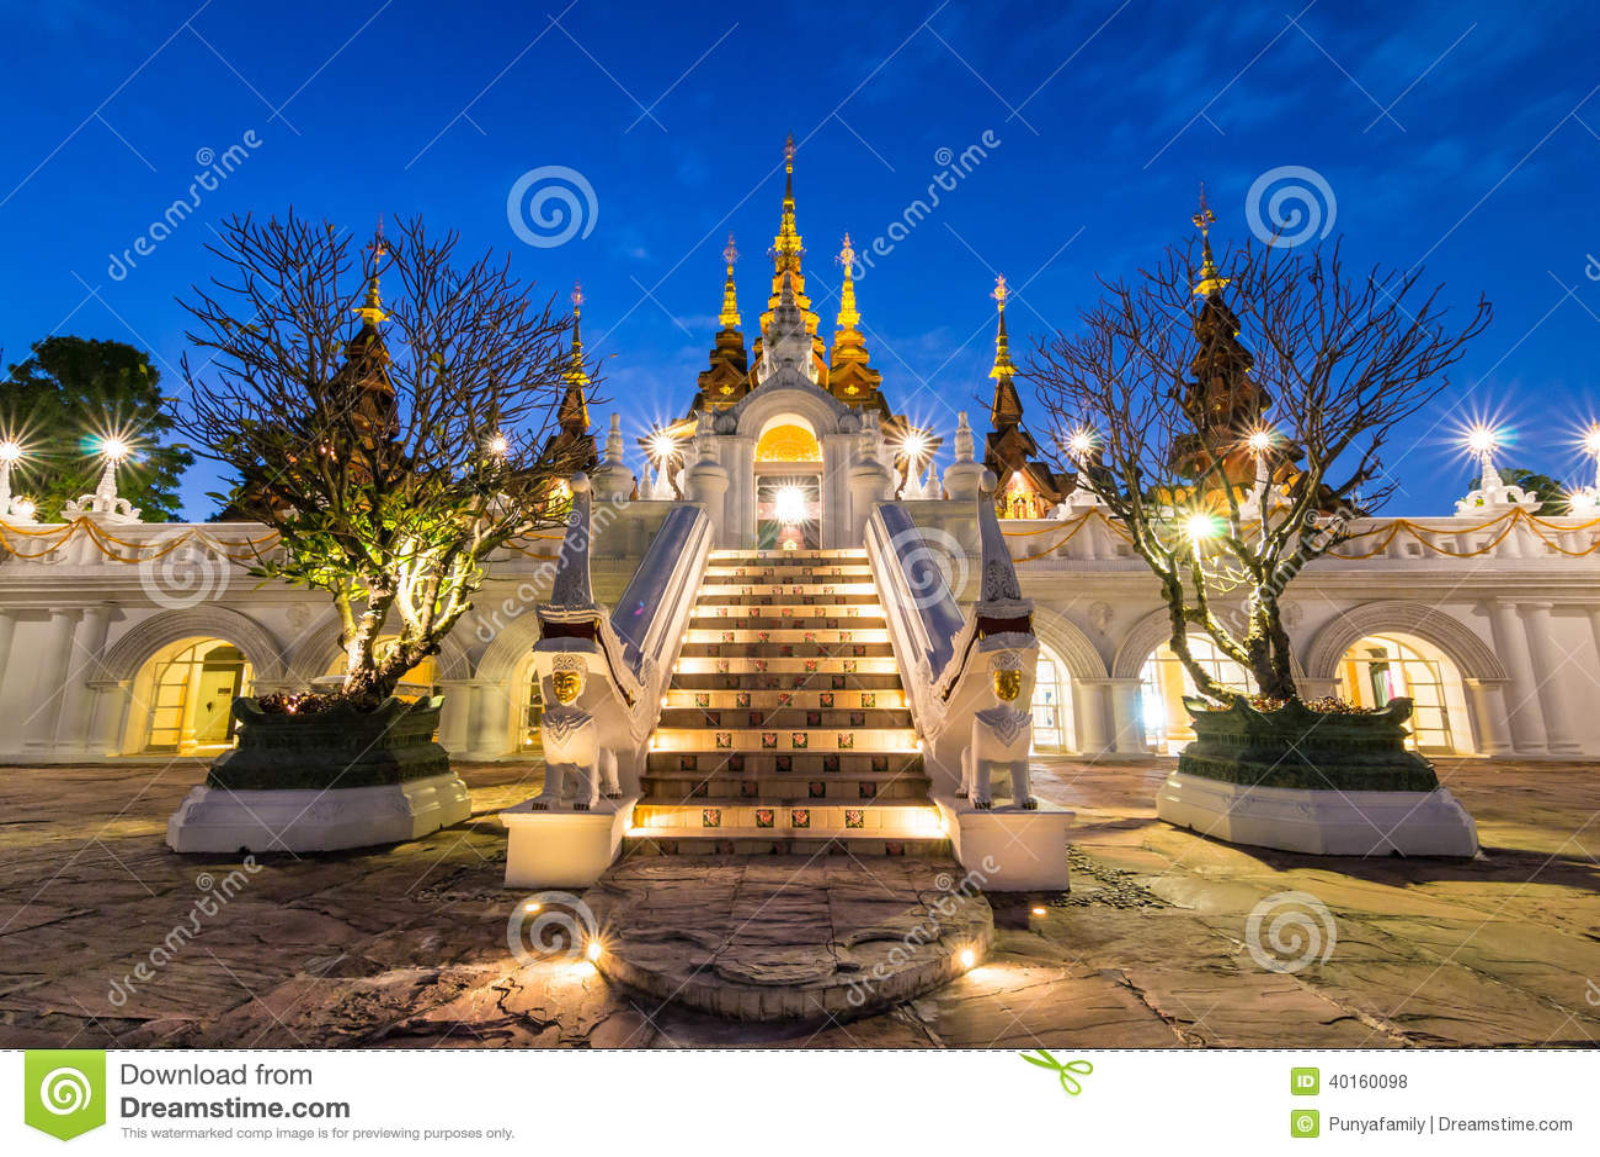 Bello hotel di Chiang Mai Thailand